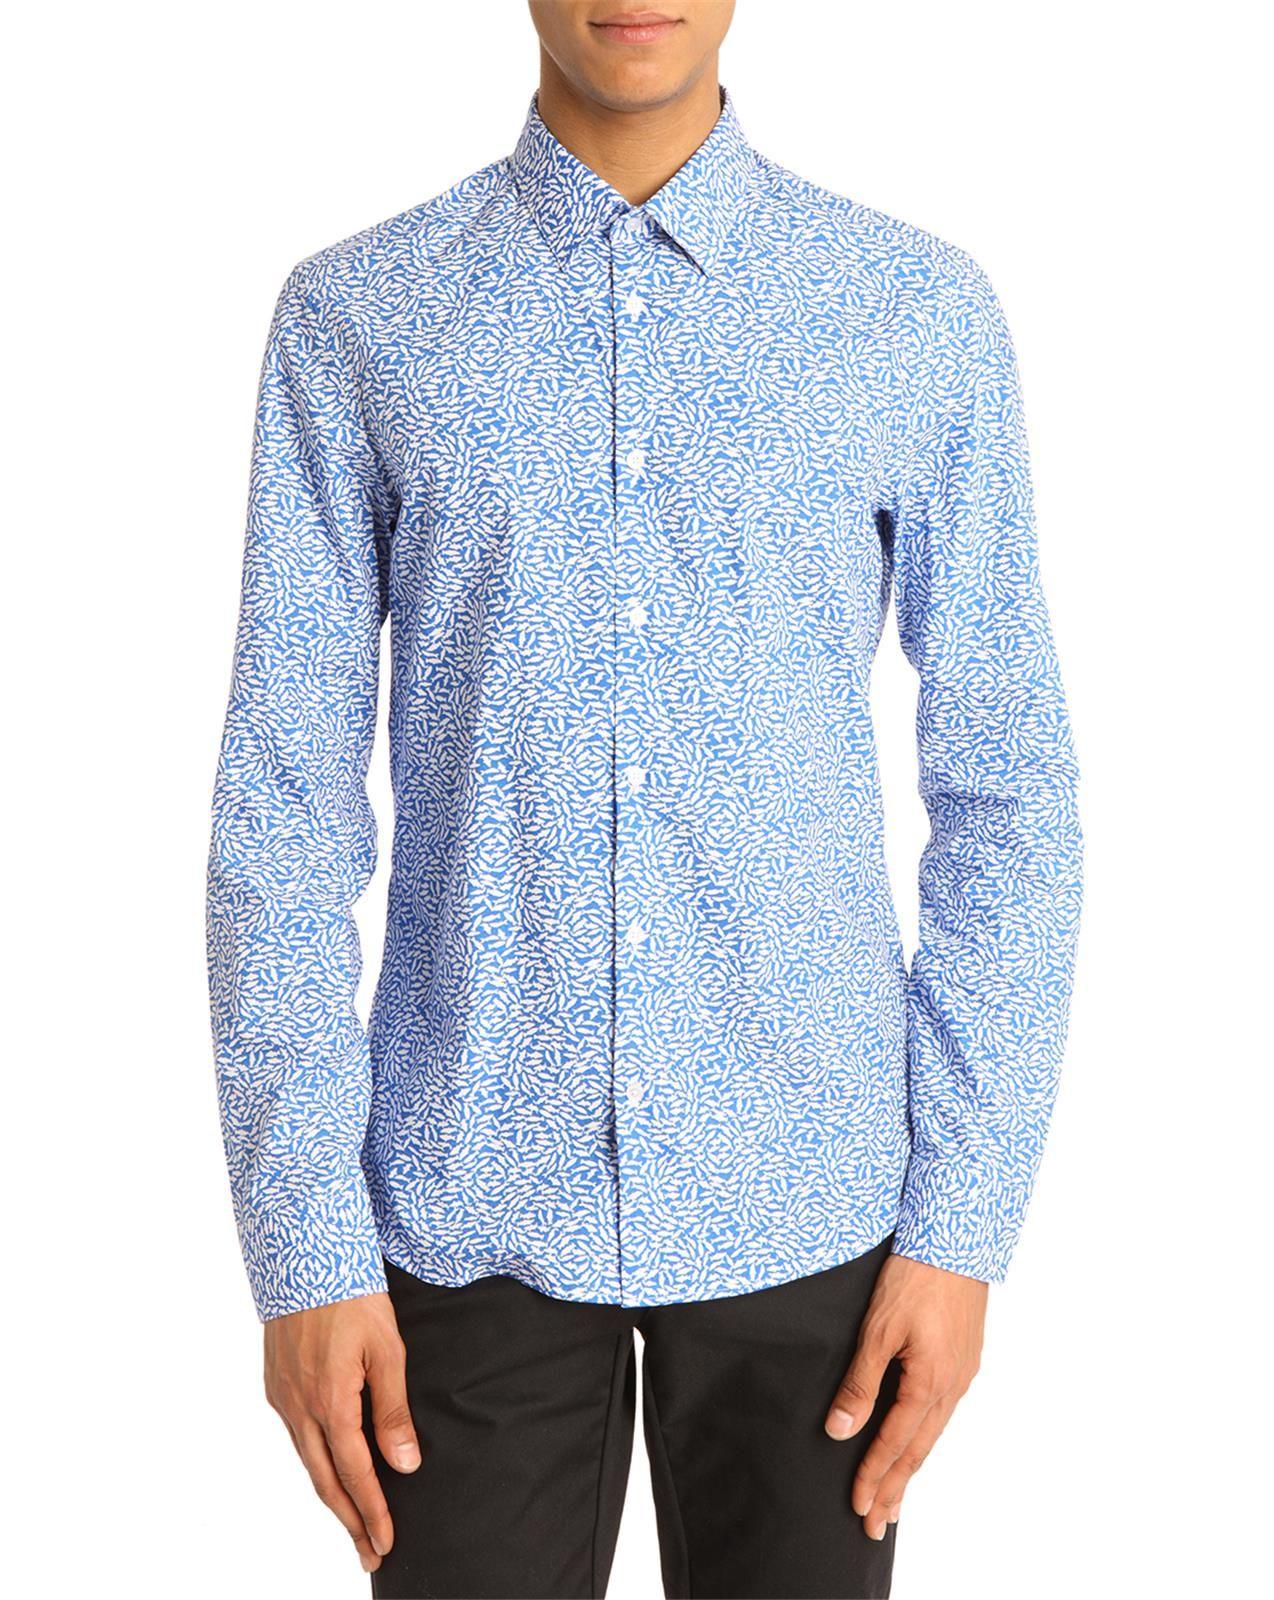 Kenzo Micro Fish Blue Print Shirt In Blue For Men Lyst